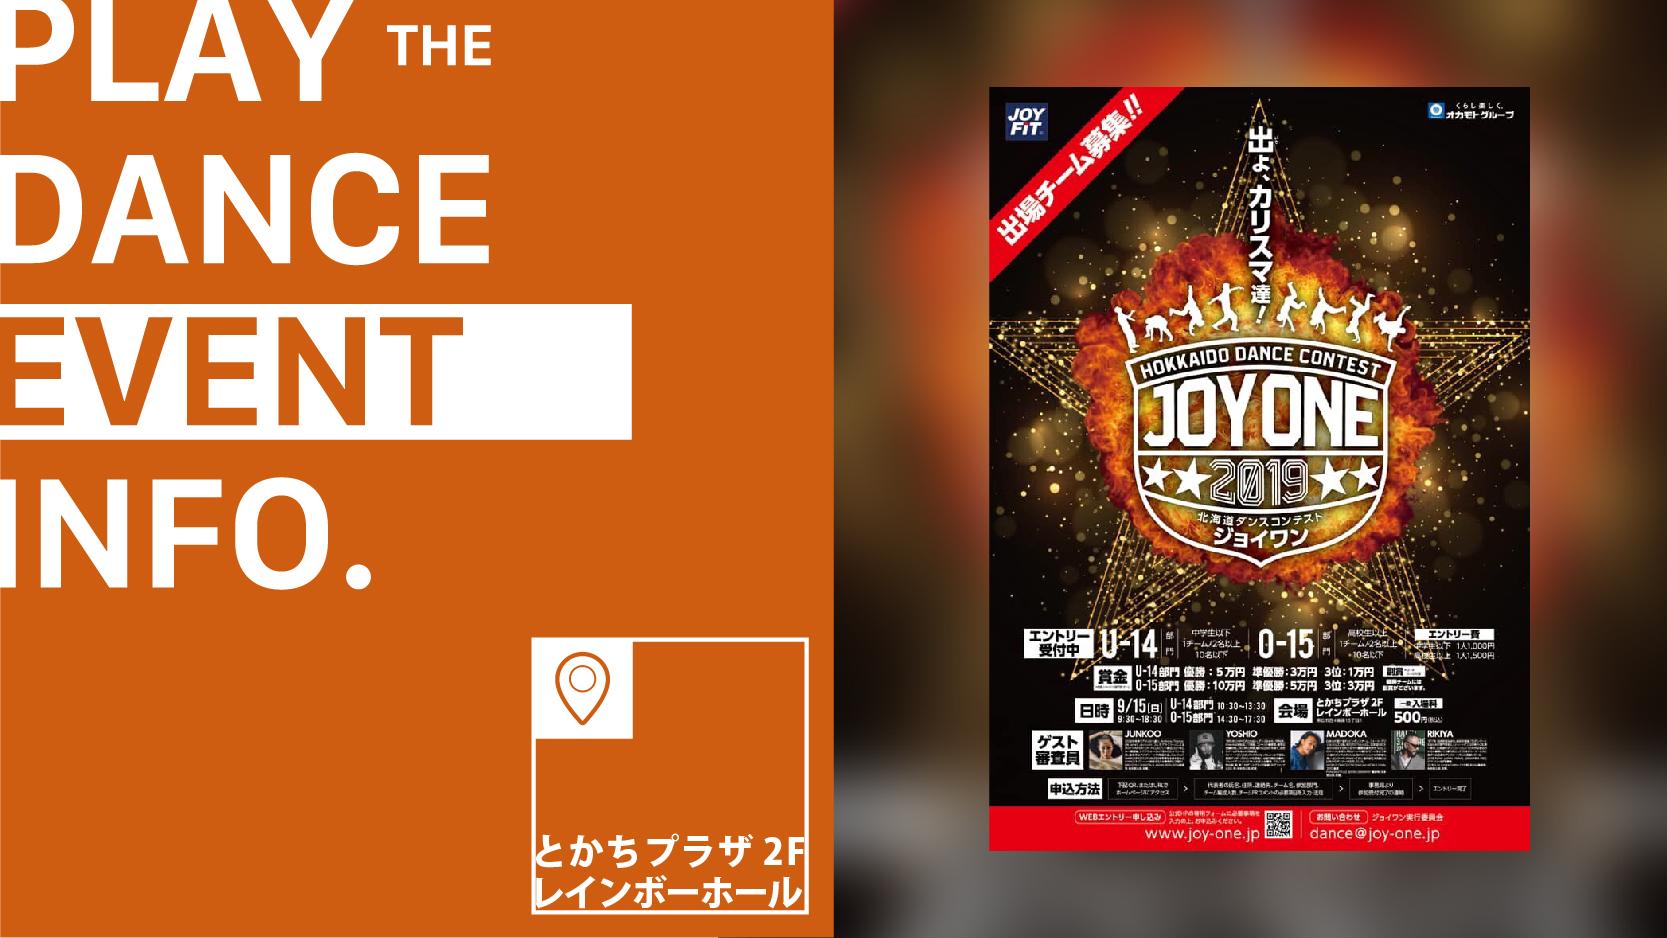 HOKKAIDO DANCE CONTEST JOYONE